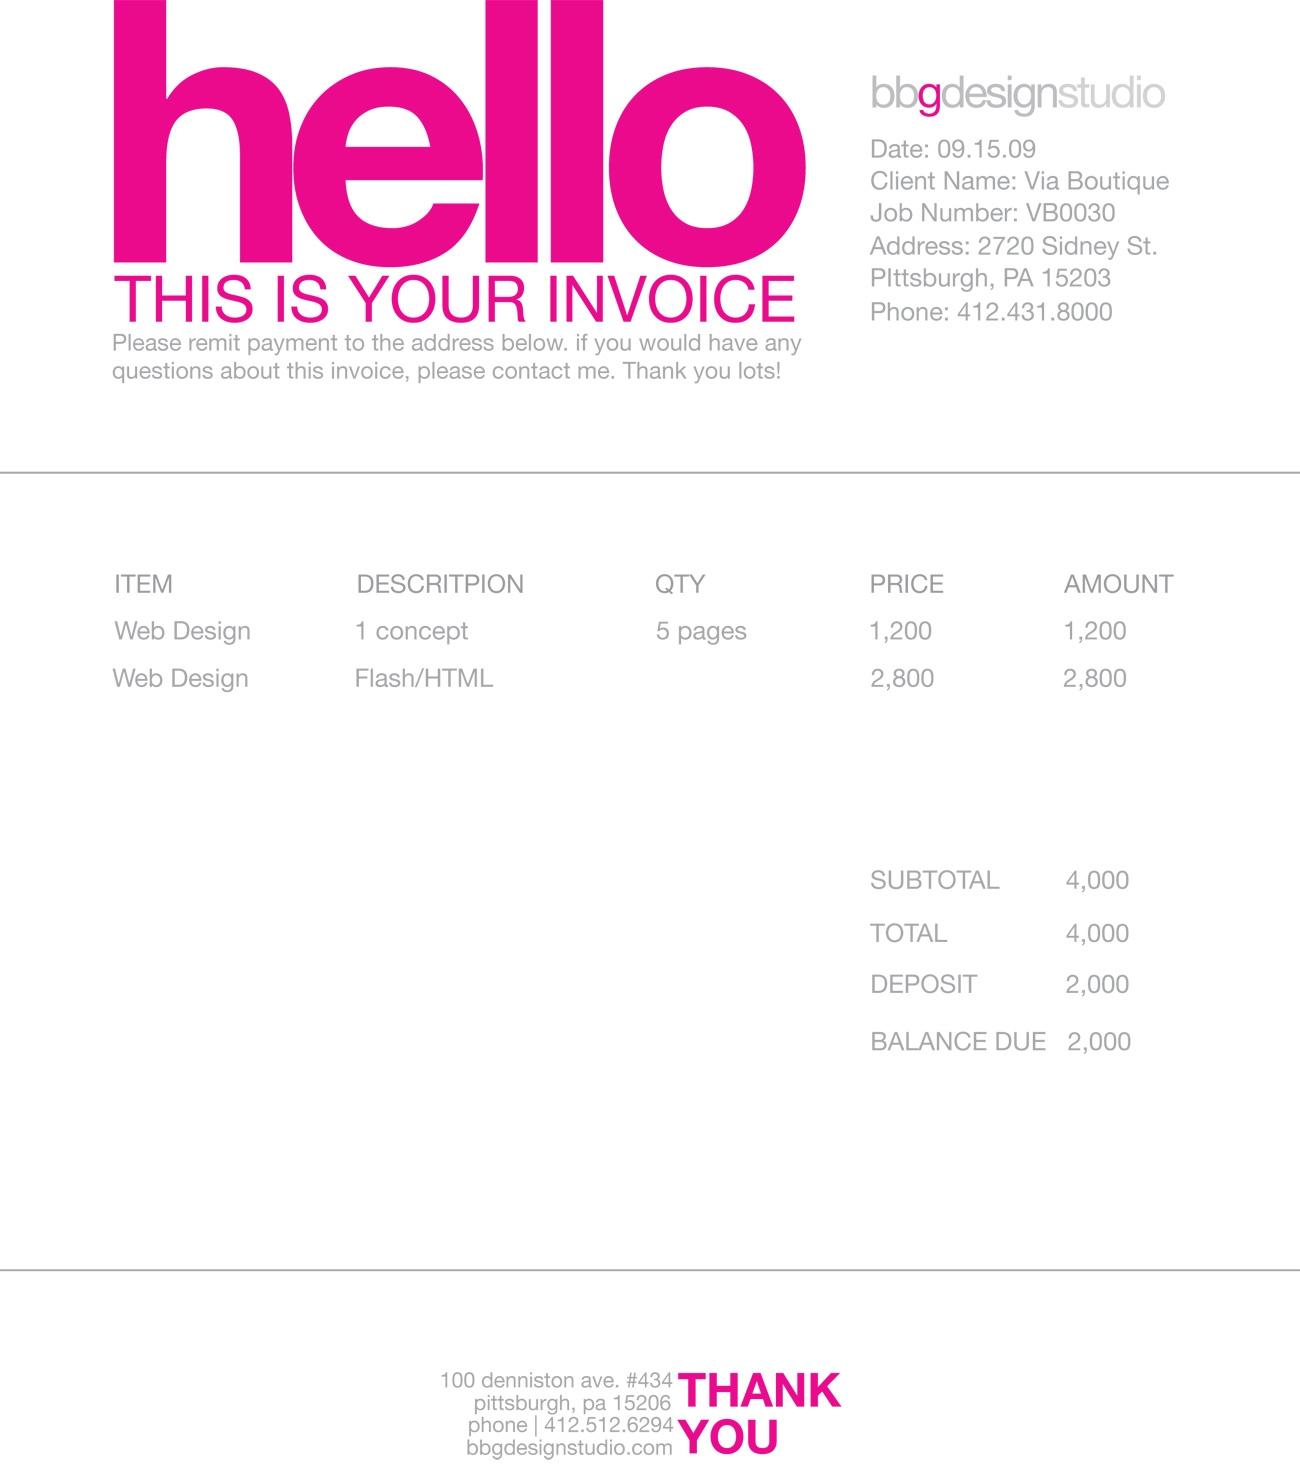 freelance invoice invoice templat sample invoice for freelance freelance designer invoice template